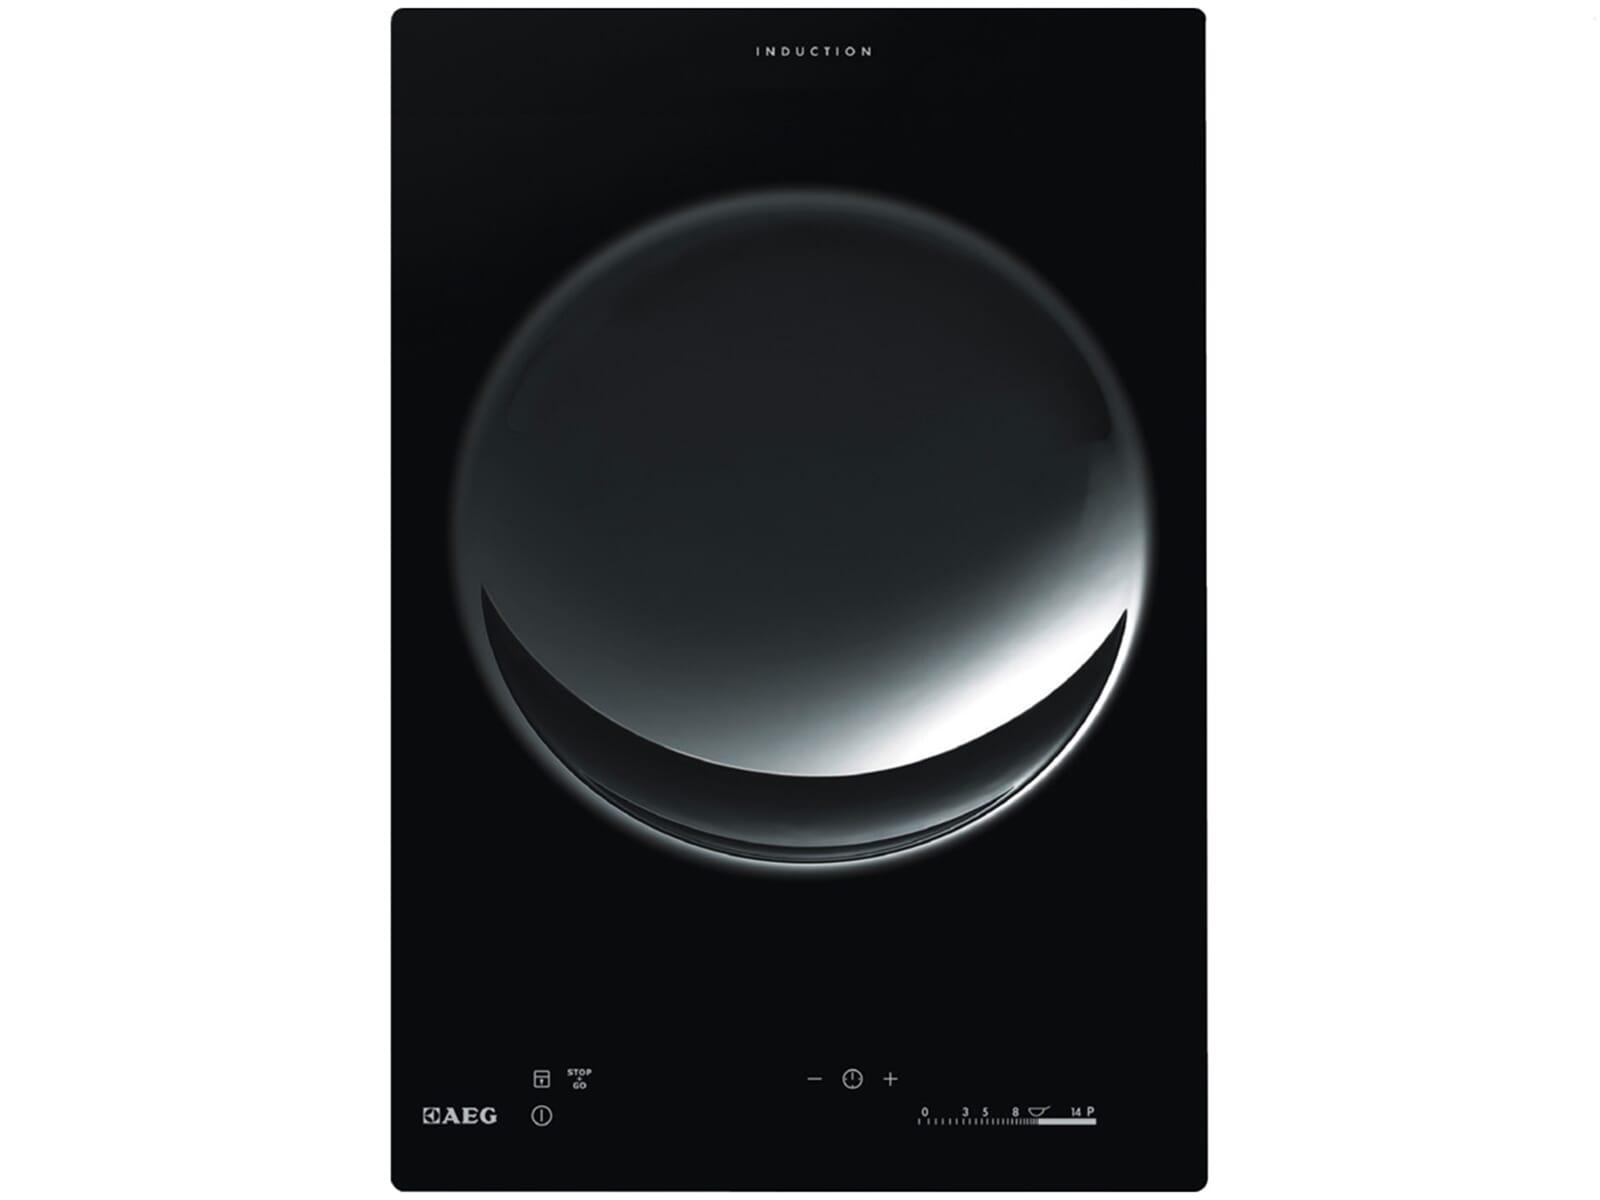 aeg hc451501eb domino induktion glaskeramik kochfeld autark wok kochmulde 36cm ebay. Black Bedroom Furniture Sets. Home Design Ideas